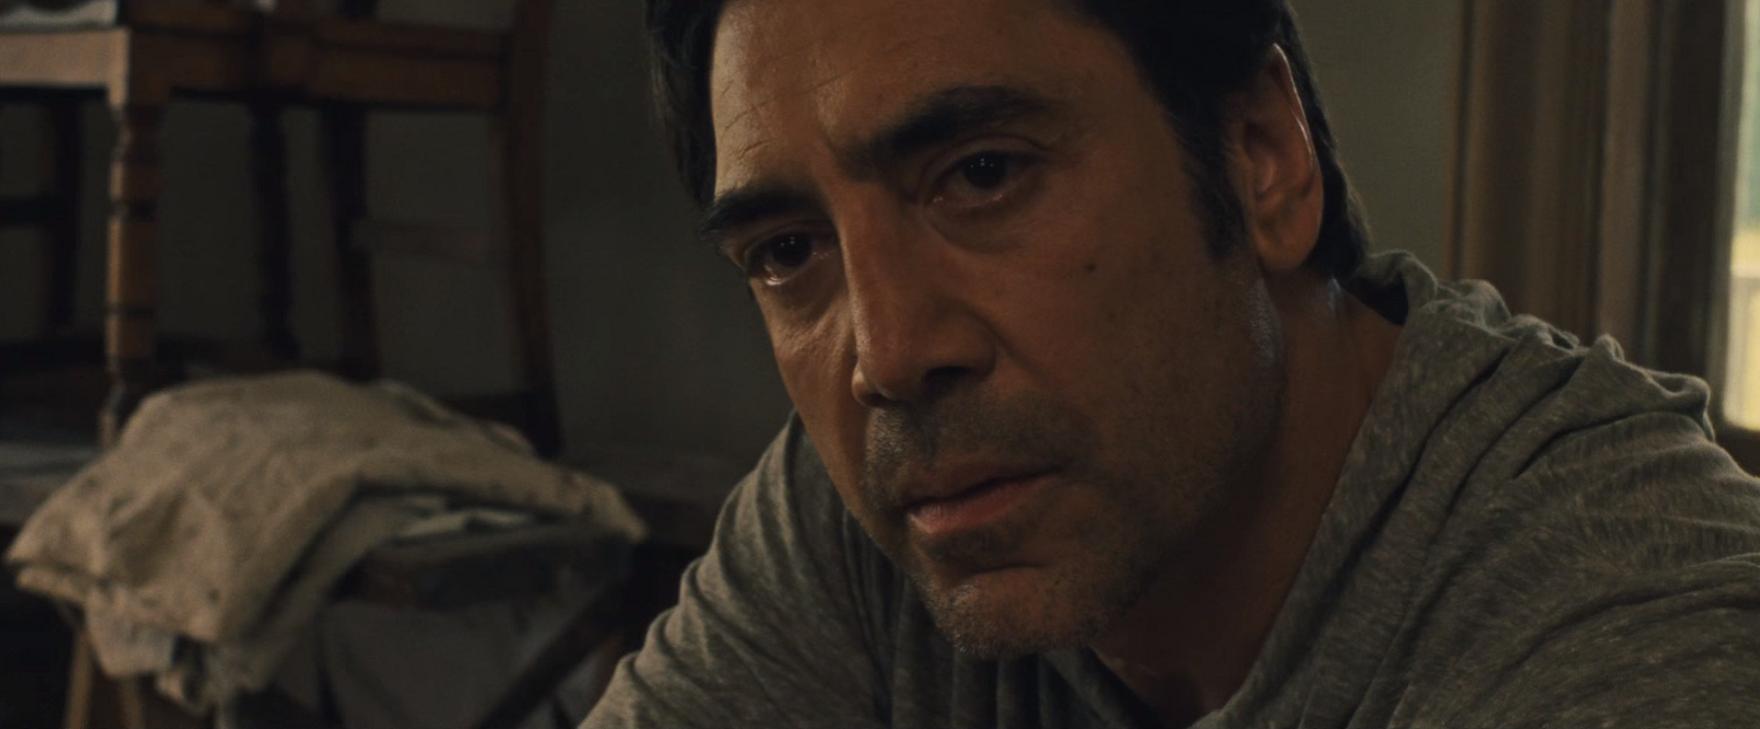 mother-movie-trailer-screencaps-6